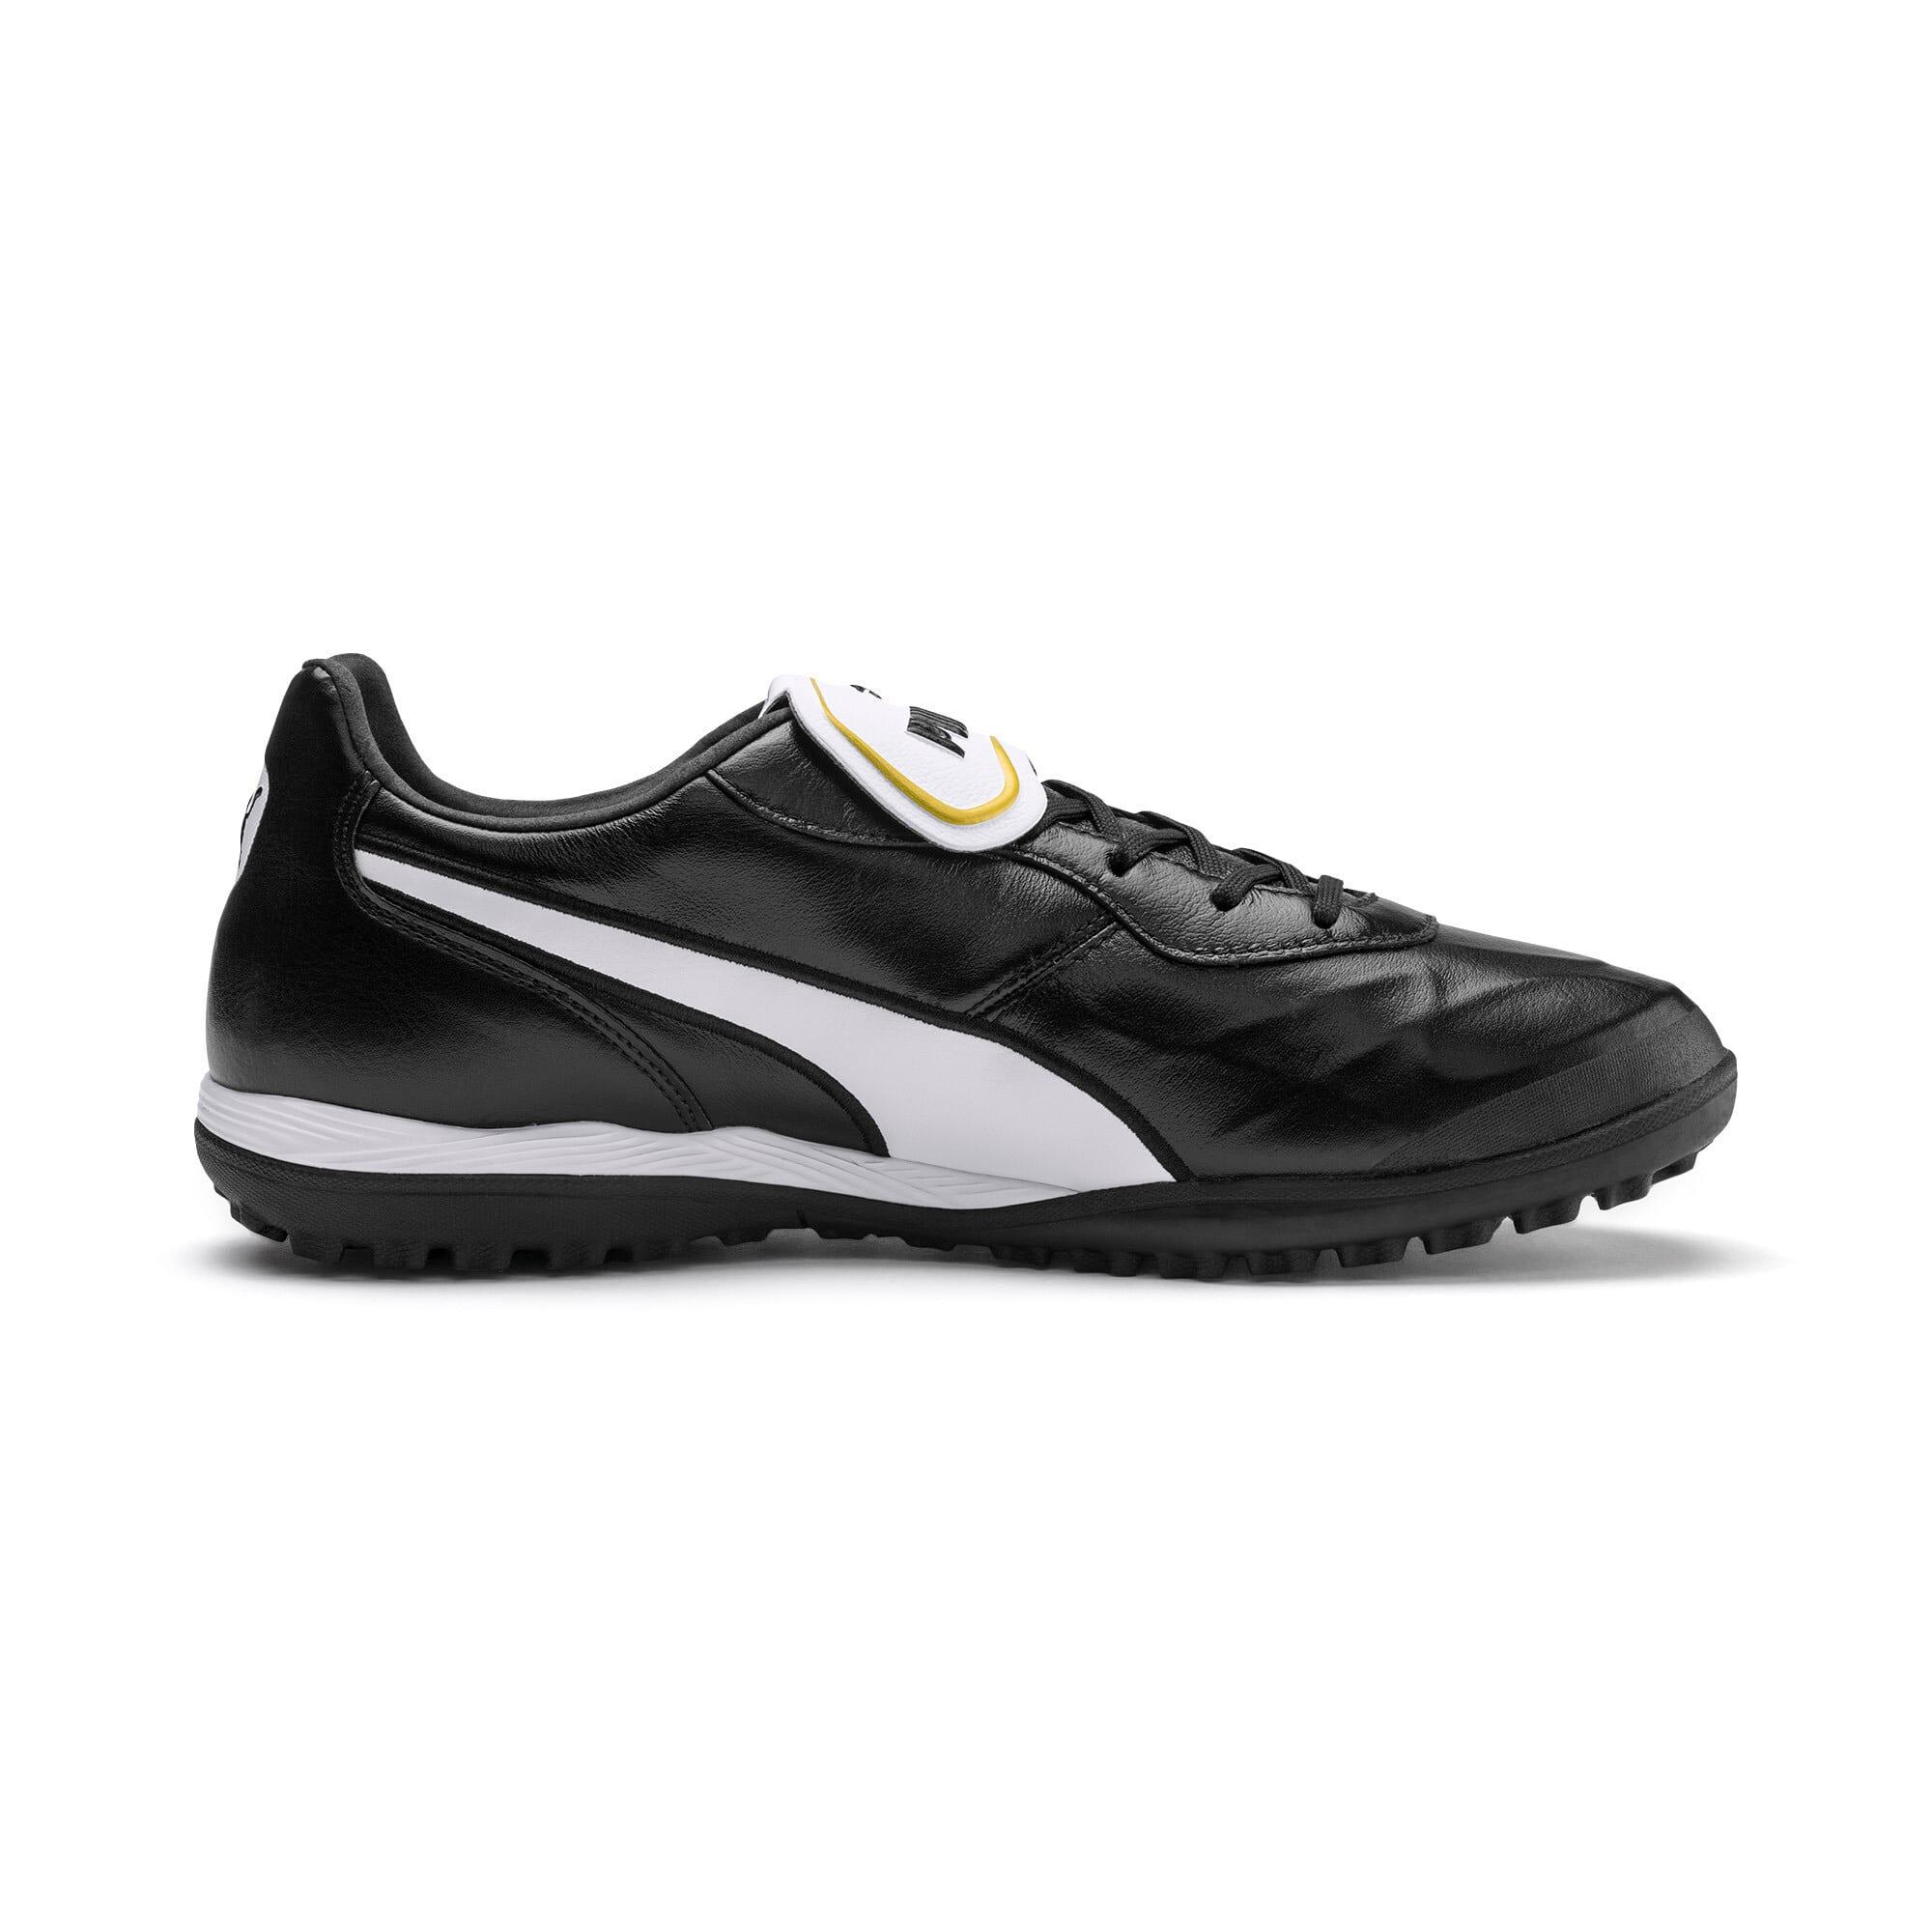 Thumbnail 6 of KING Top TT voetbalschoenen voor heren, Puma Black-Puma White, medium